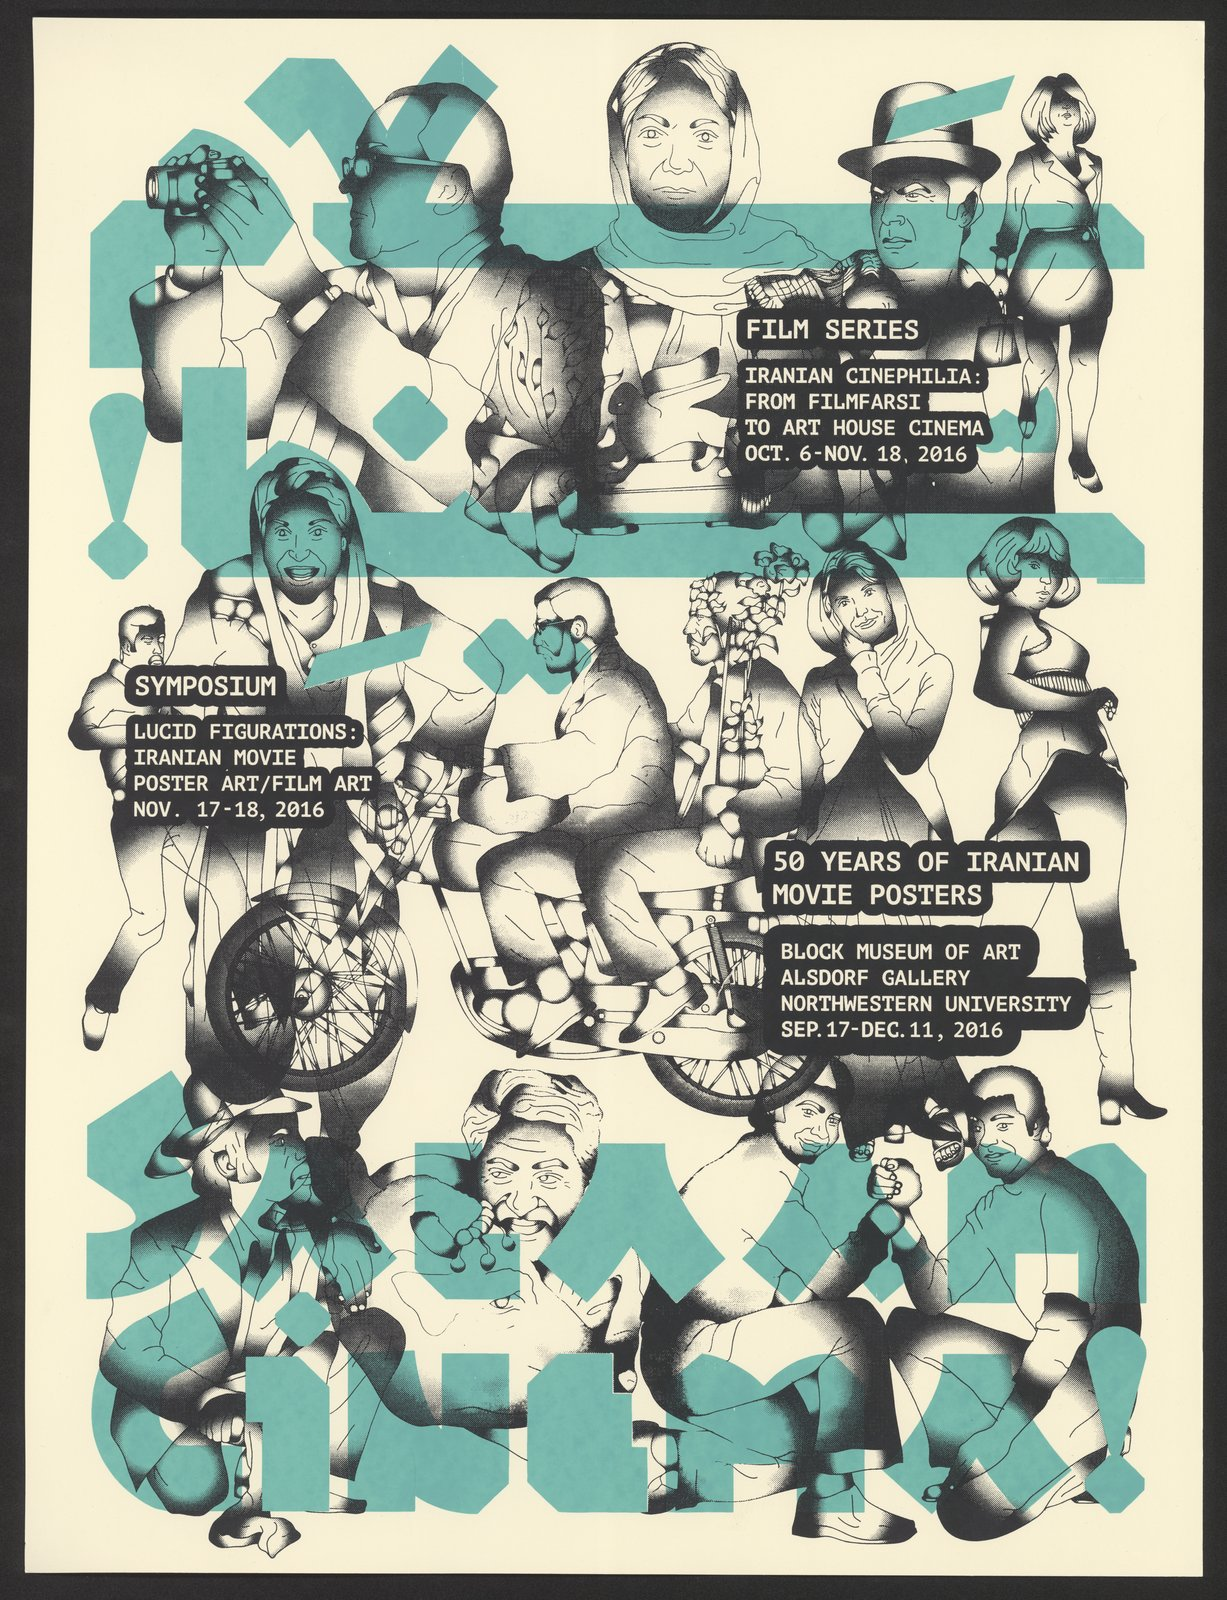 Poster designed by Rāmbod Vālā for  Salaam Cinema!  exhibition, symposium, and film series: ©Rāmbod Vālā